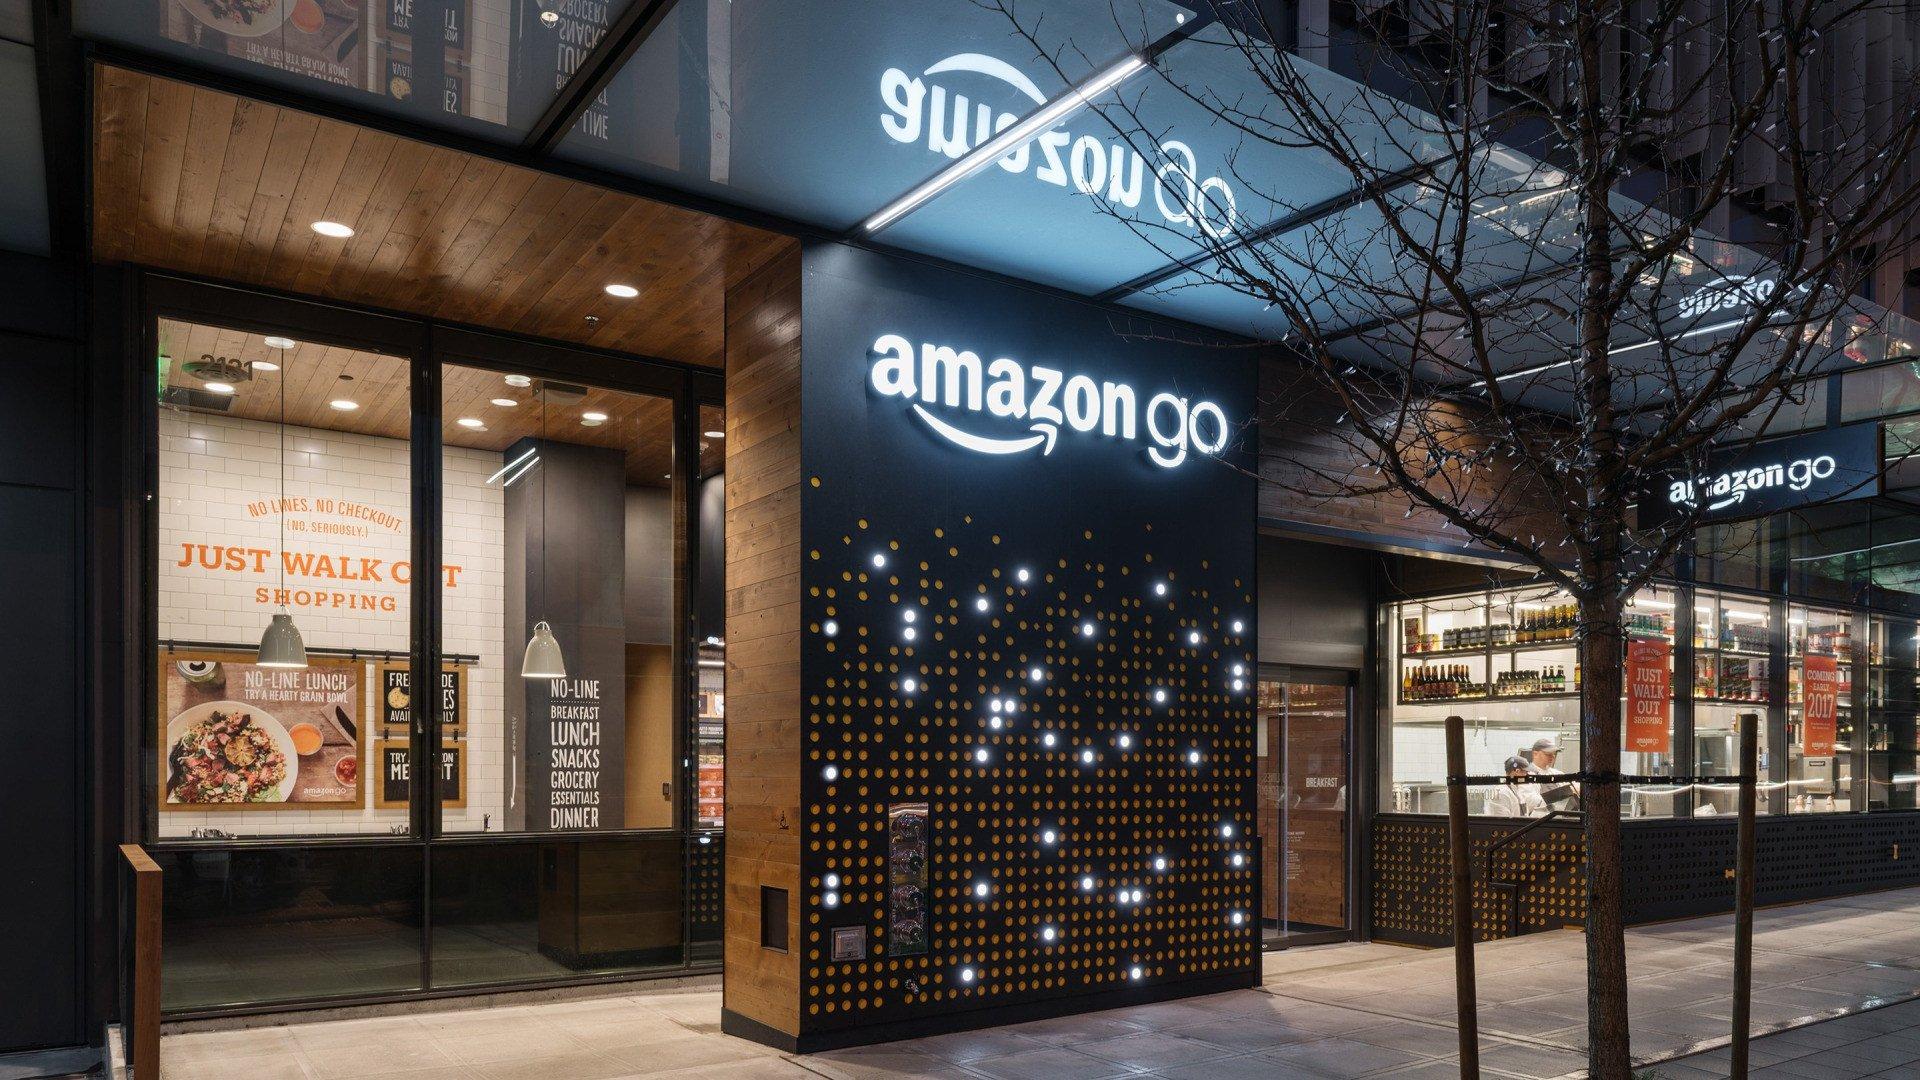 Amazon, Supermarkt, London, Amazon GO, Amazon Go Grocery